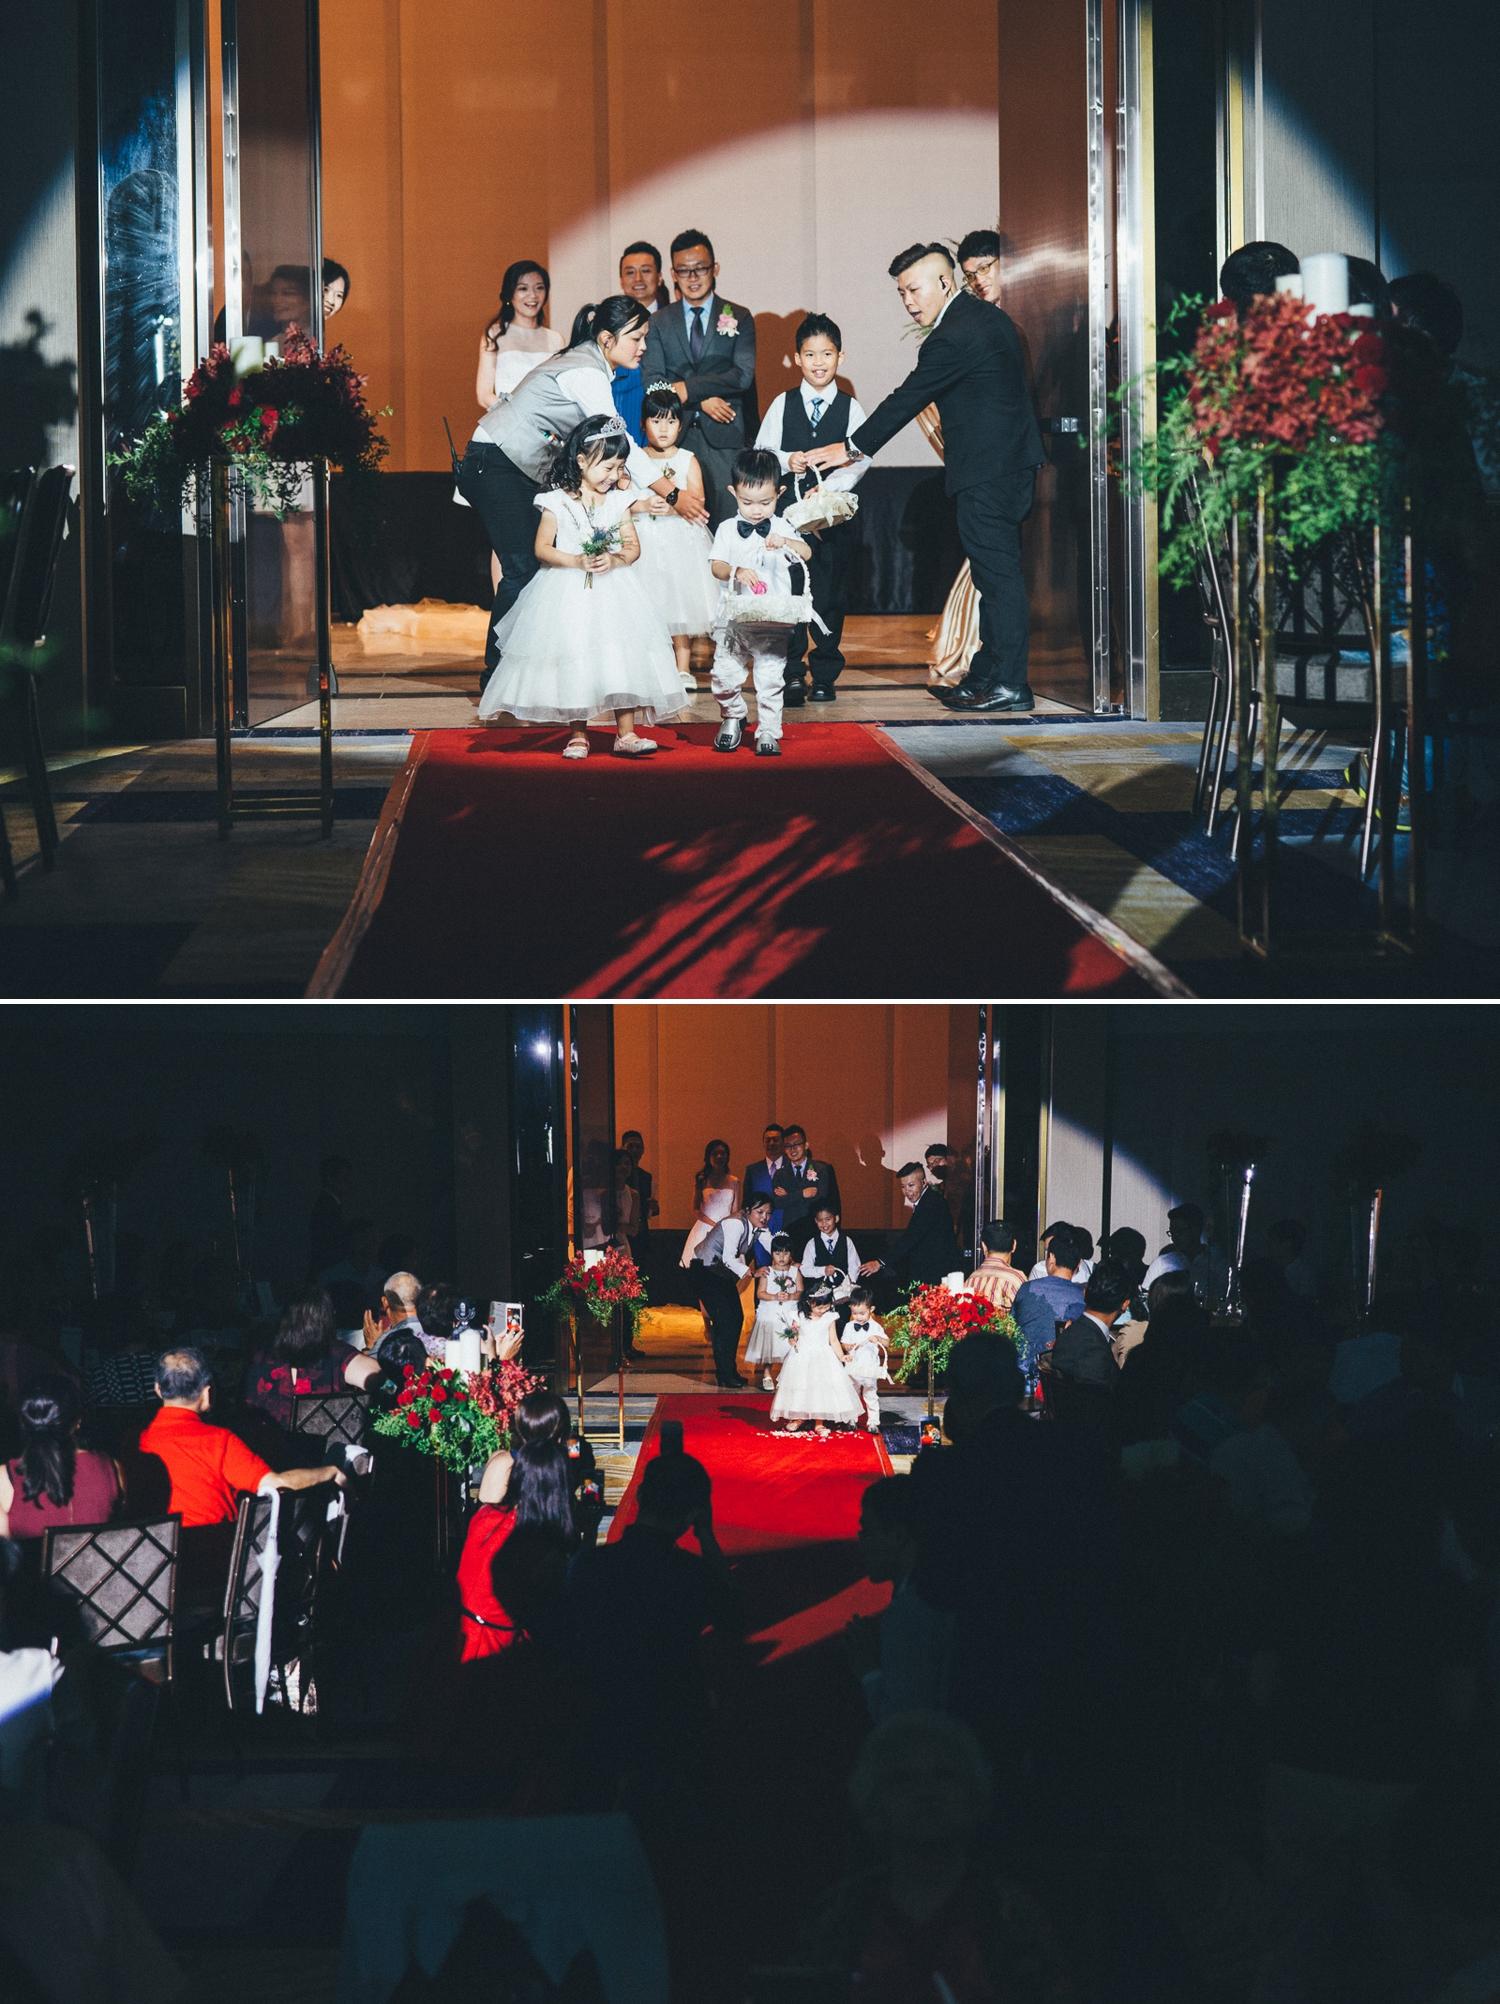 pure婚紗婚禮攝影